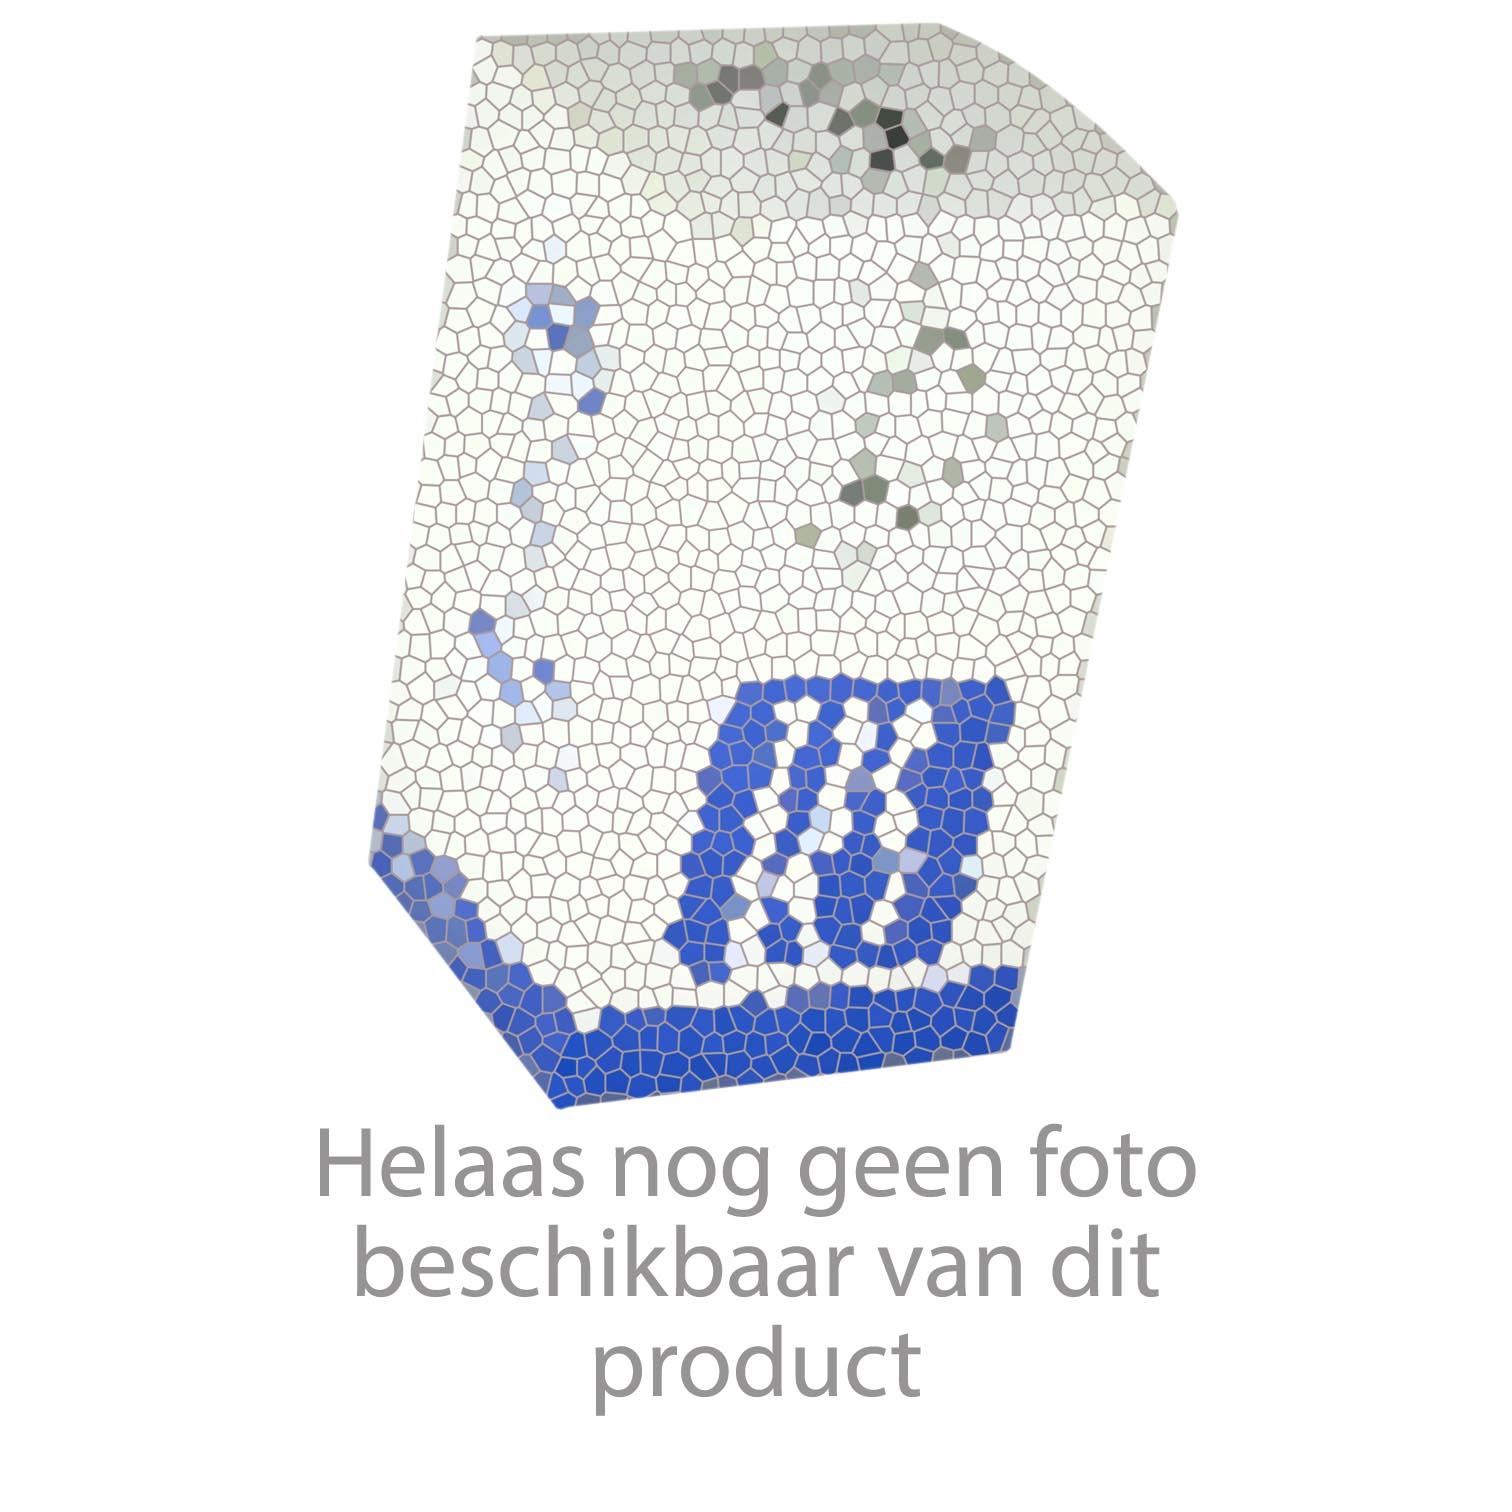 Grohe onderdelen Allure Brilliant Wastafelmengkraan Gladde Body 23033000